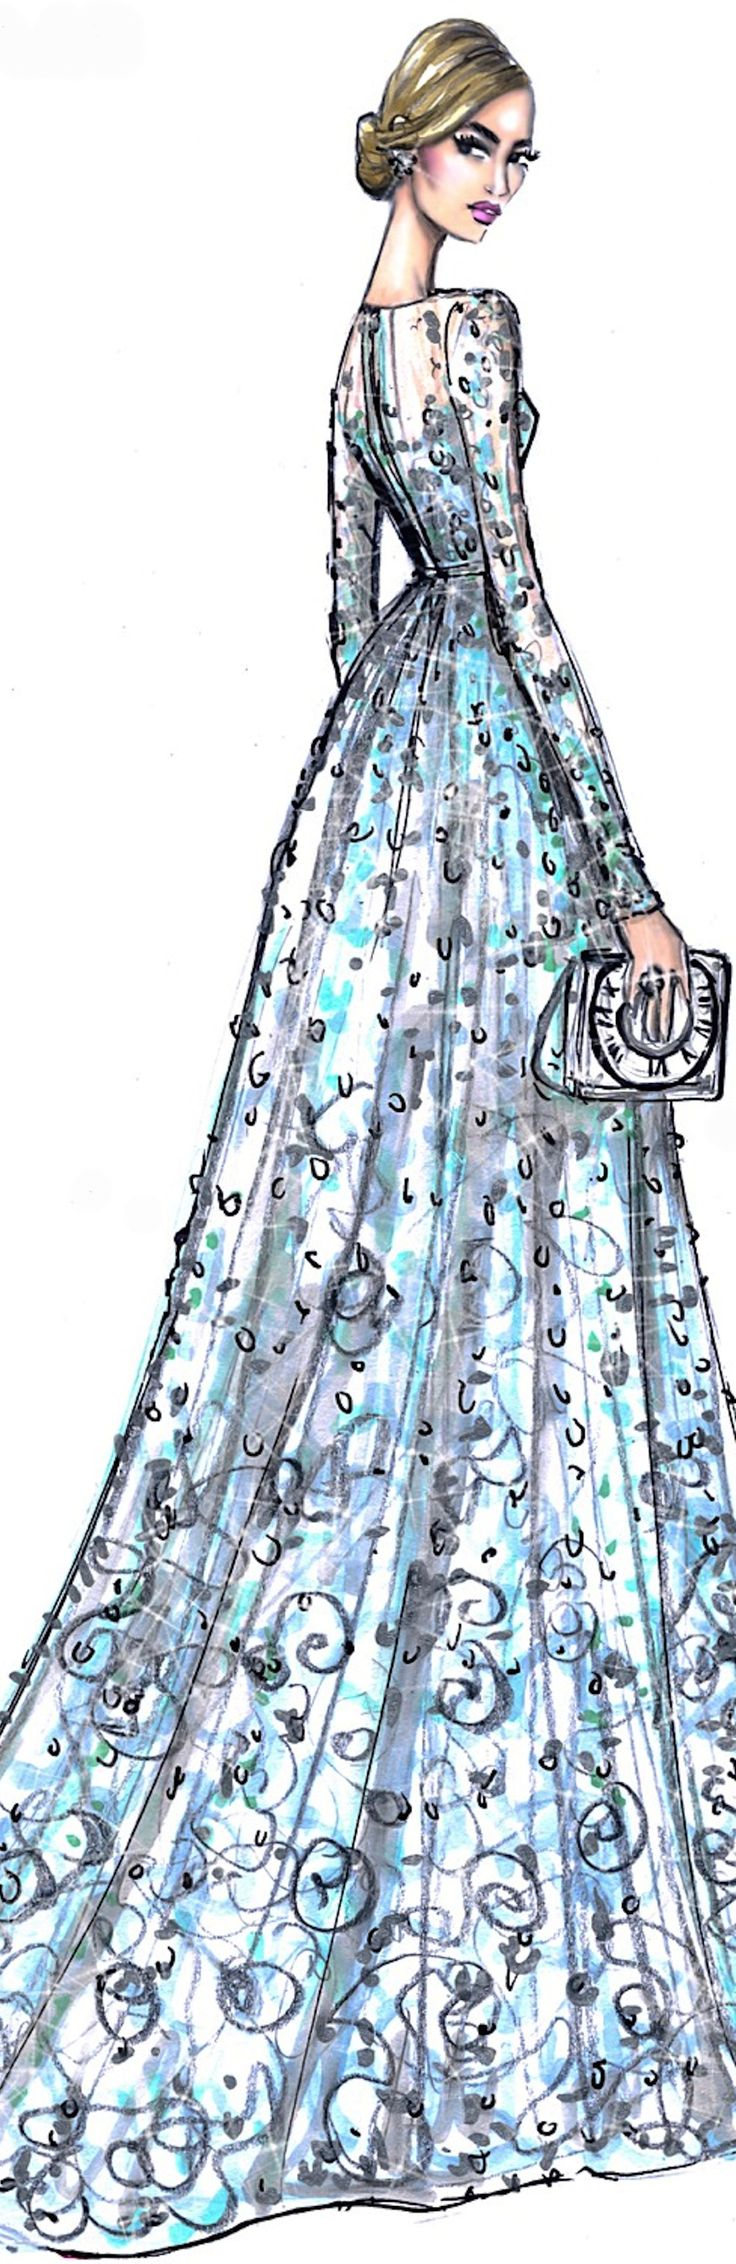 Fashion Illustration by Hayden Williams for Elie Saab Cinderella premiere.